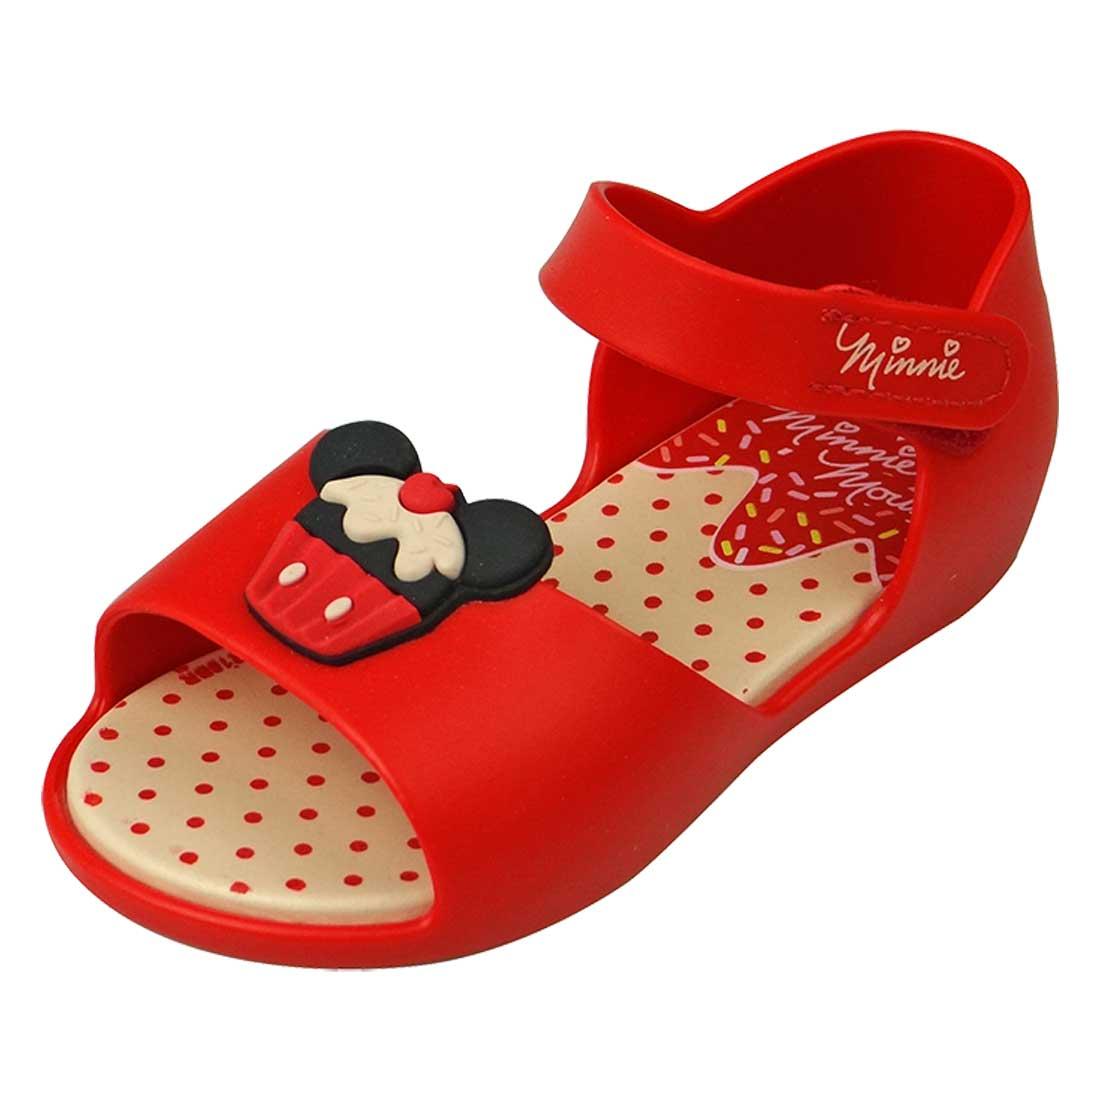 Sandália Disney Minnie Fun Cupcake - Branca e Vermelha